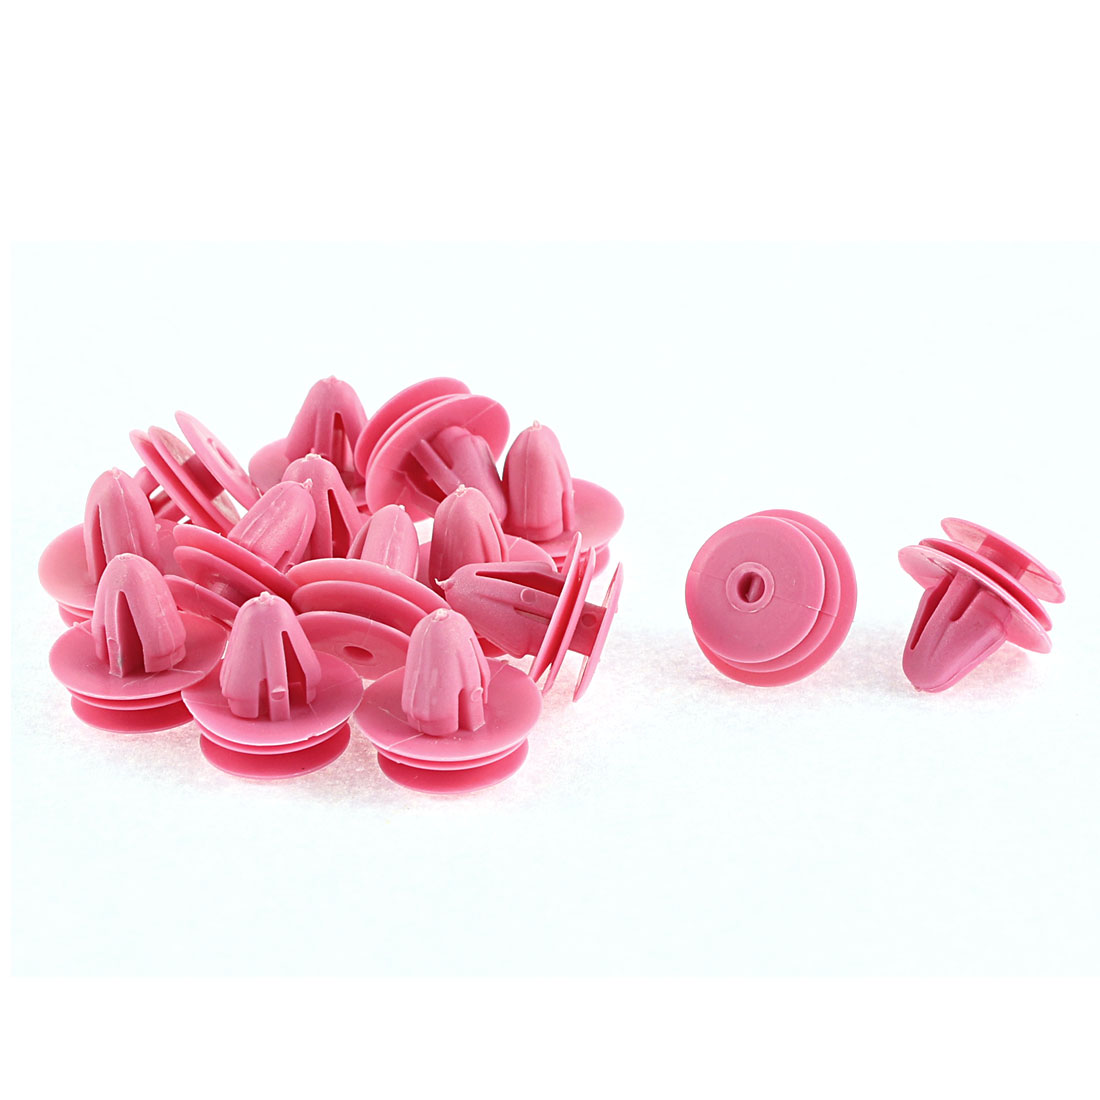 15 Pcs 10mm x 7.5mm Hole Fuchsia Plastic Rivets Fastener for  Elantra